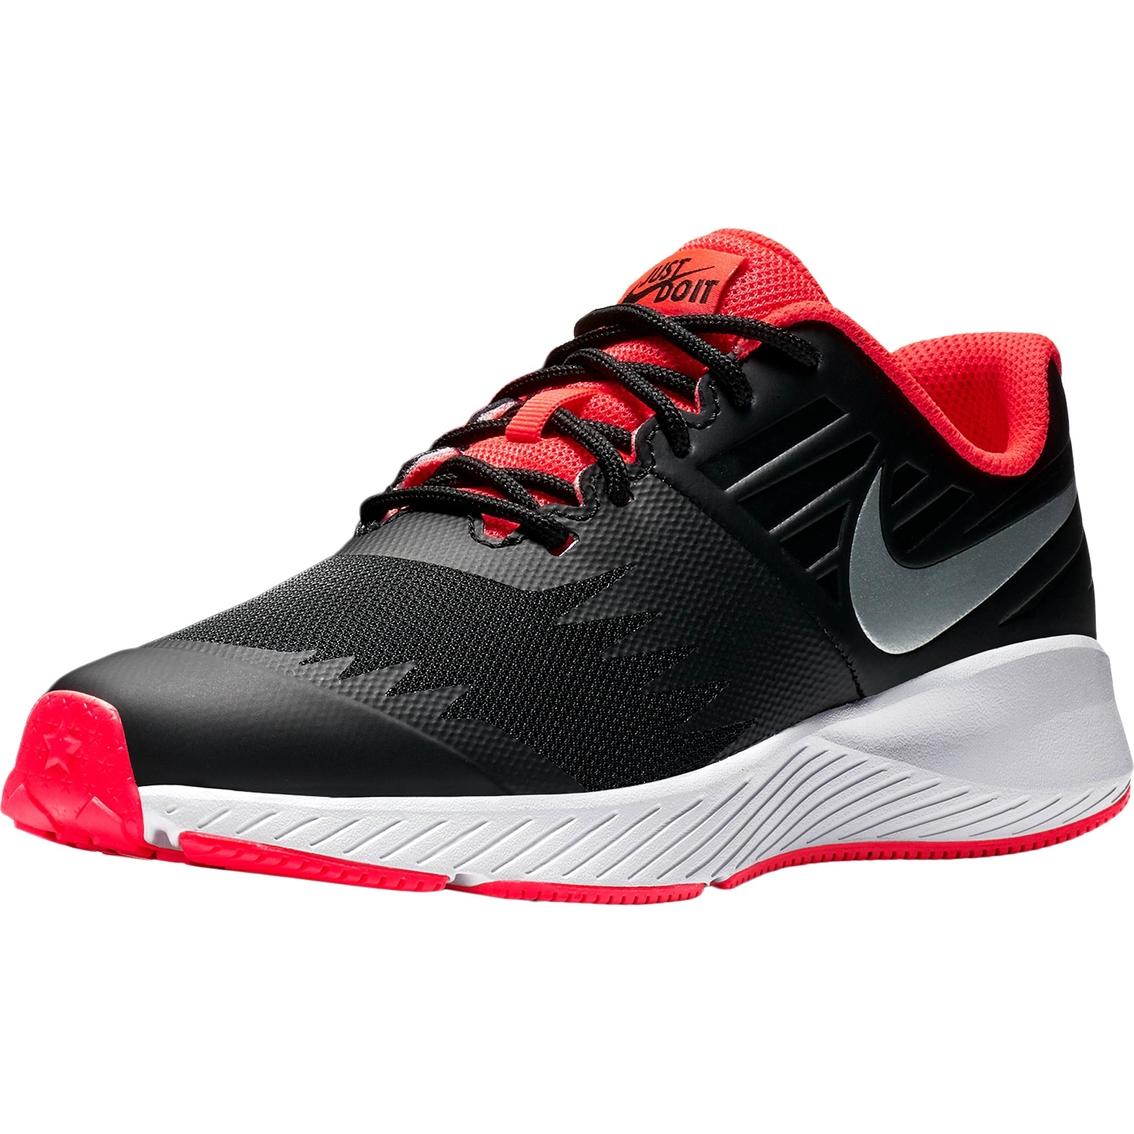 55d78c70235 Nike Grade School Boys Star Runner Jdi Running Shoes